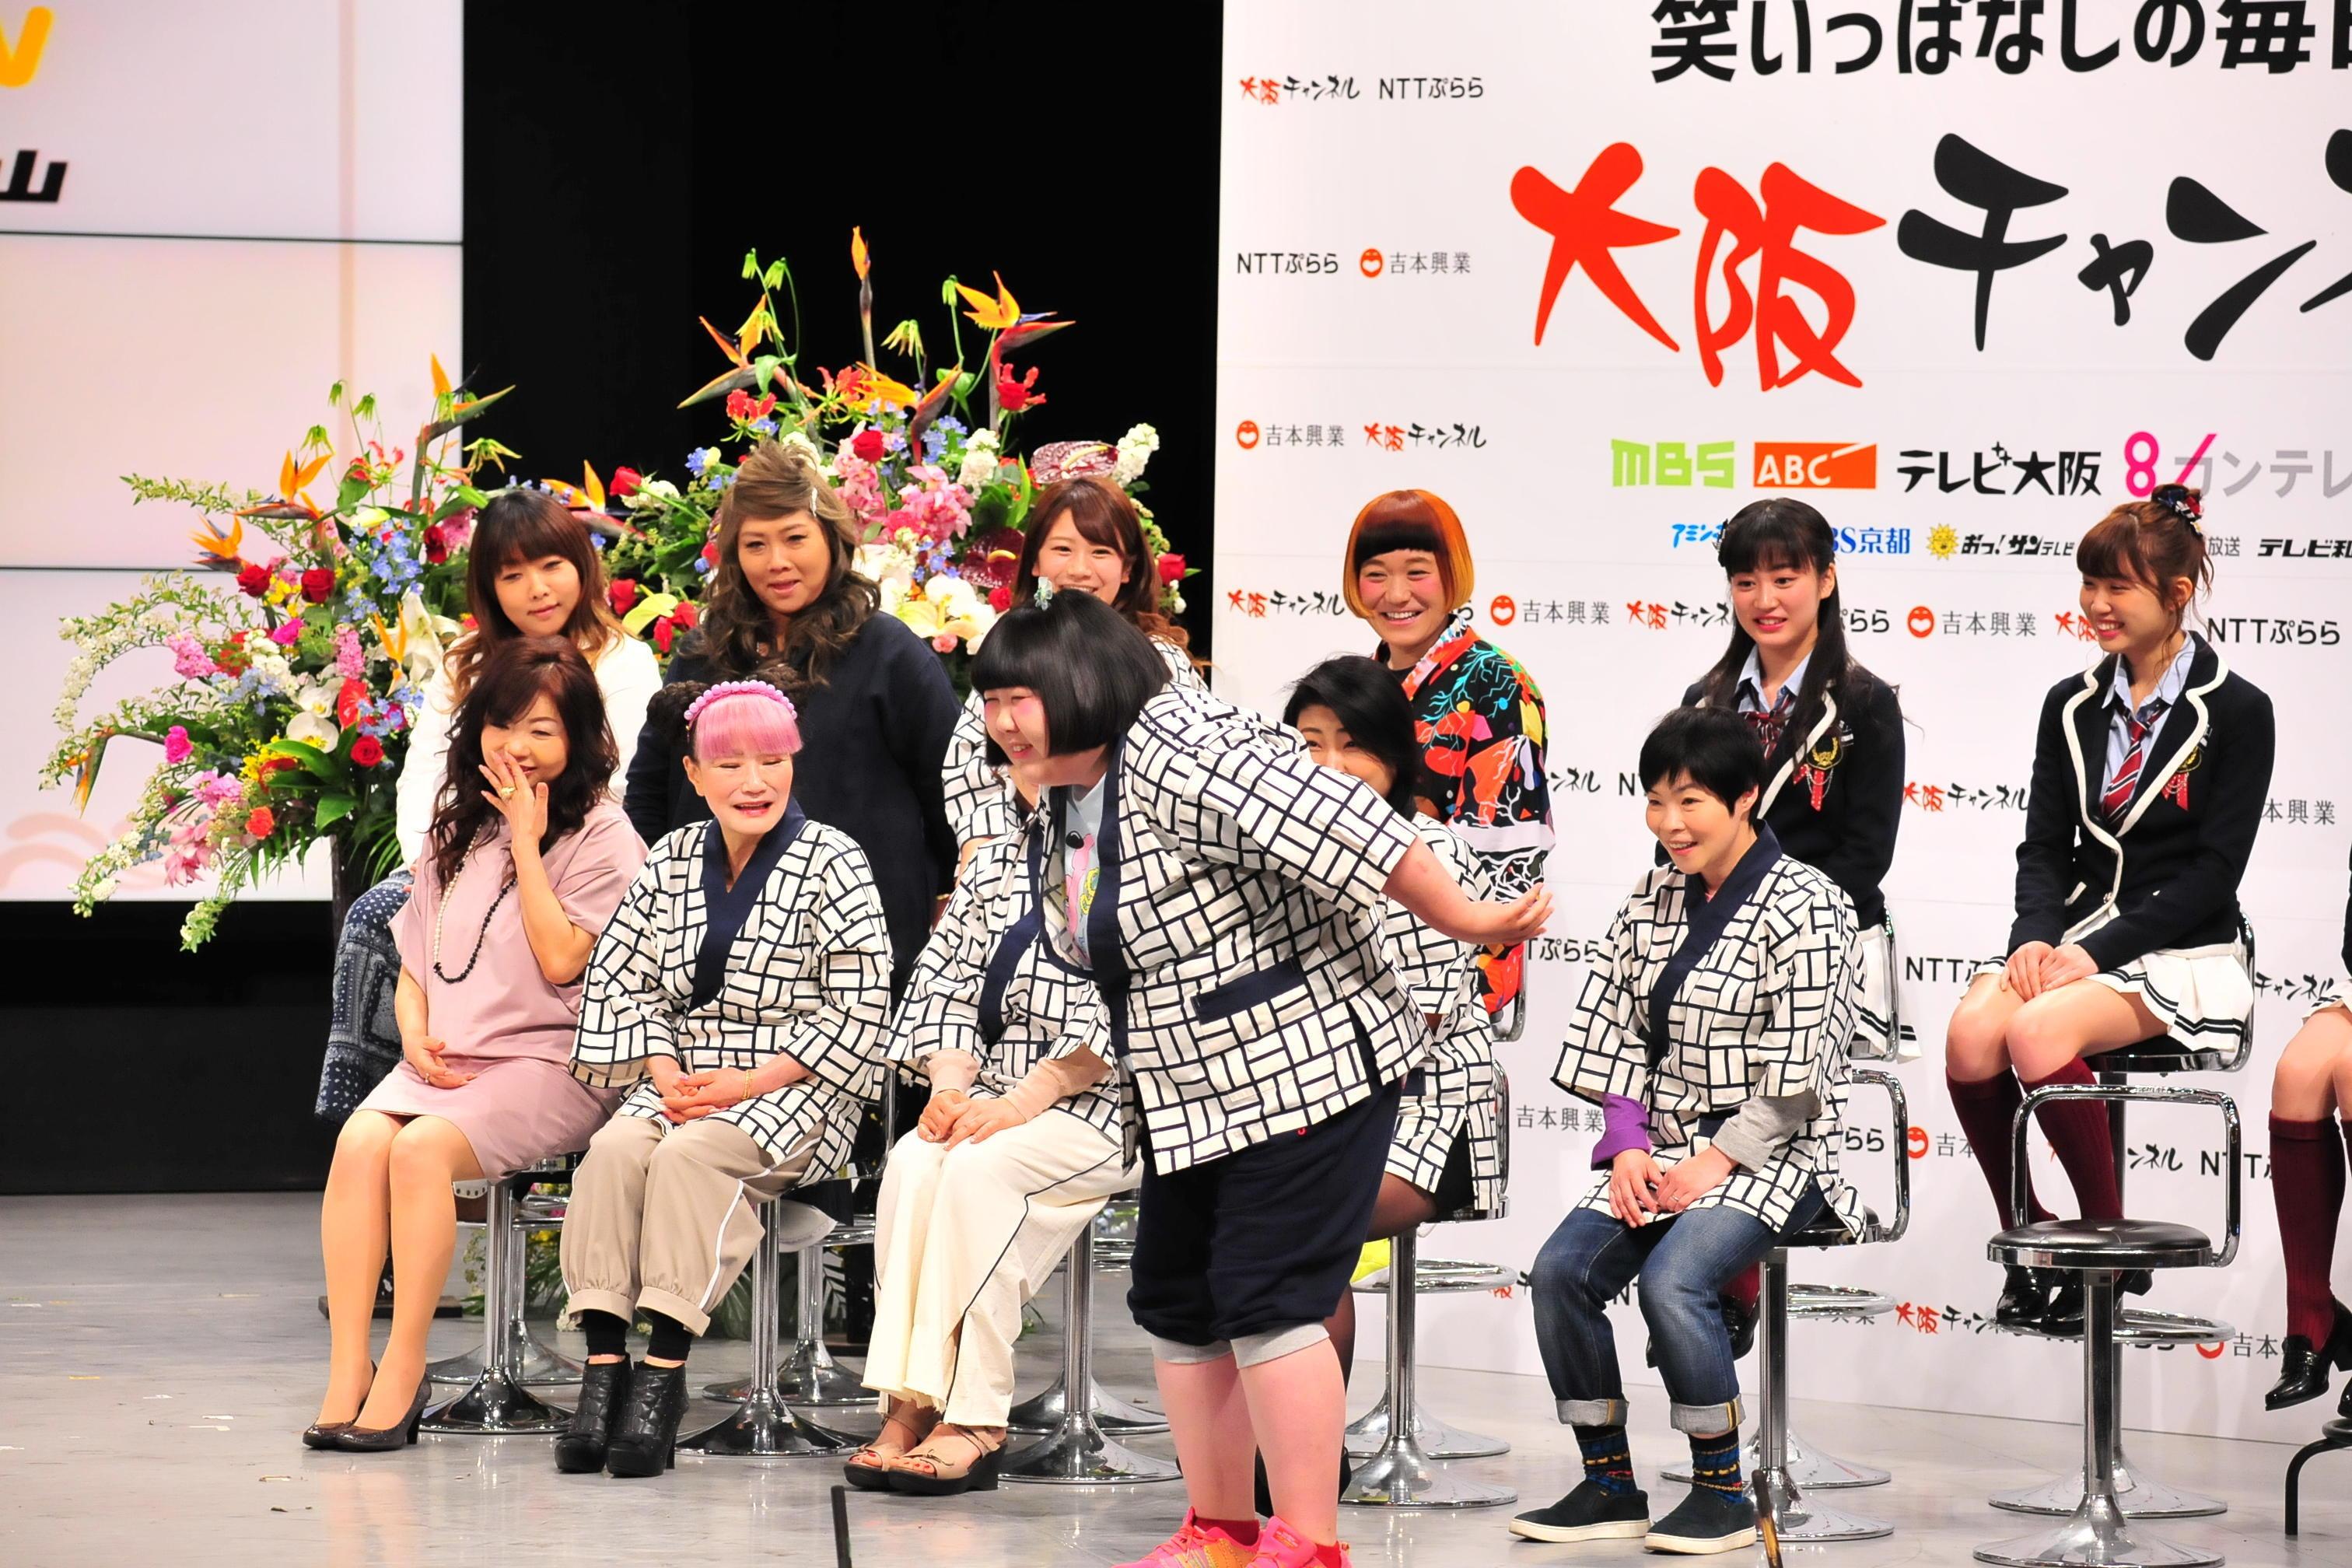 http://news.yoshimoto.co.jp/20170425160915-0e6302c29a3182983e3a4d40361ff5a779077017.jpg